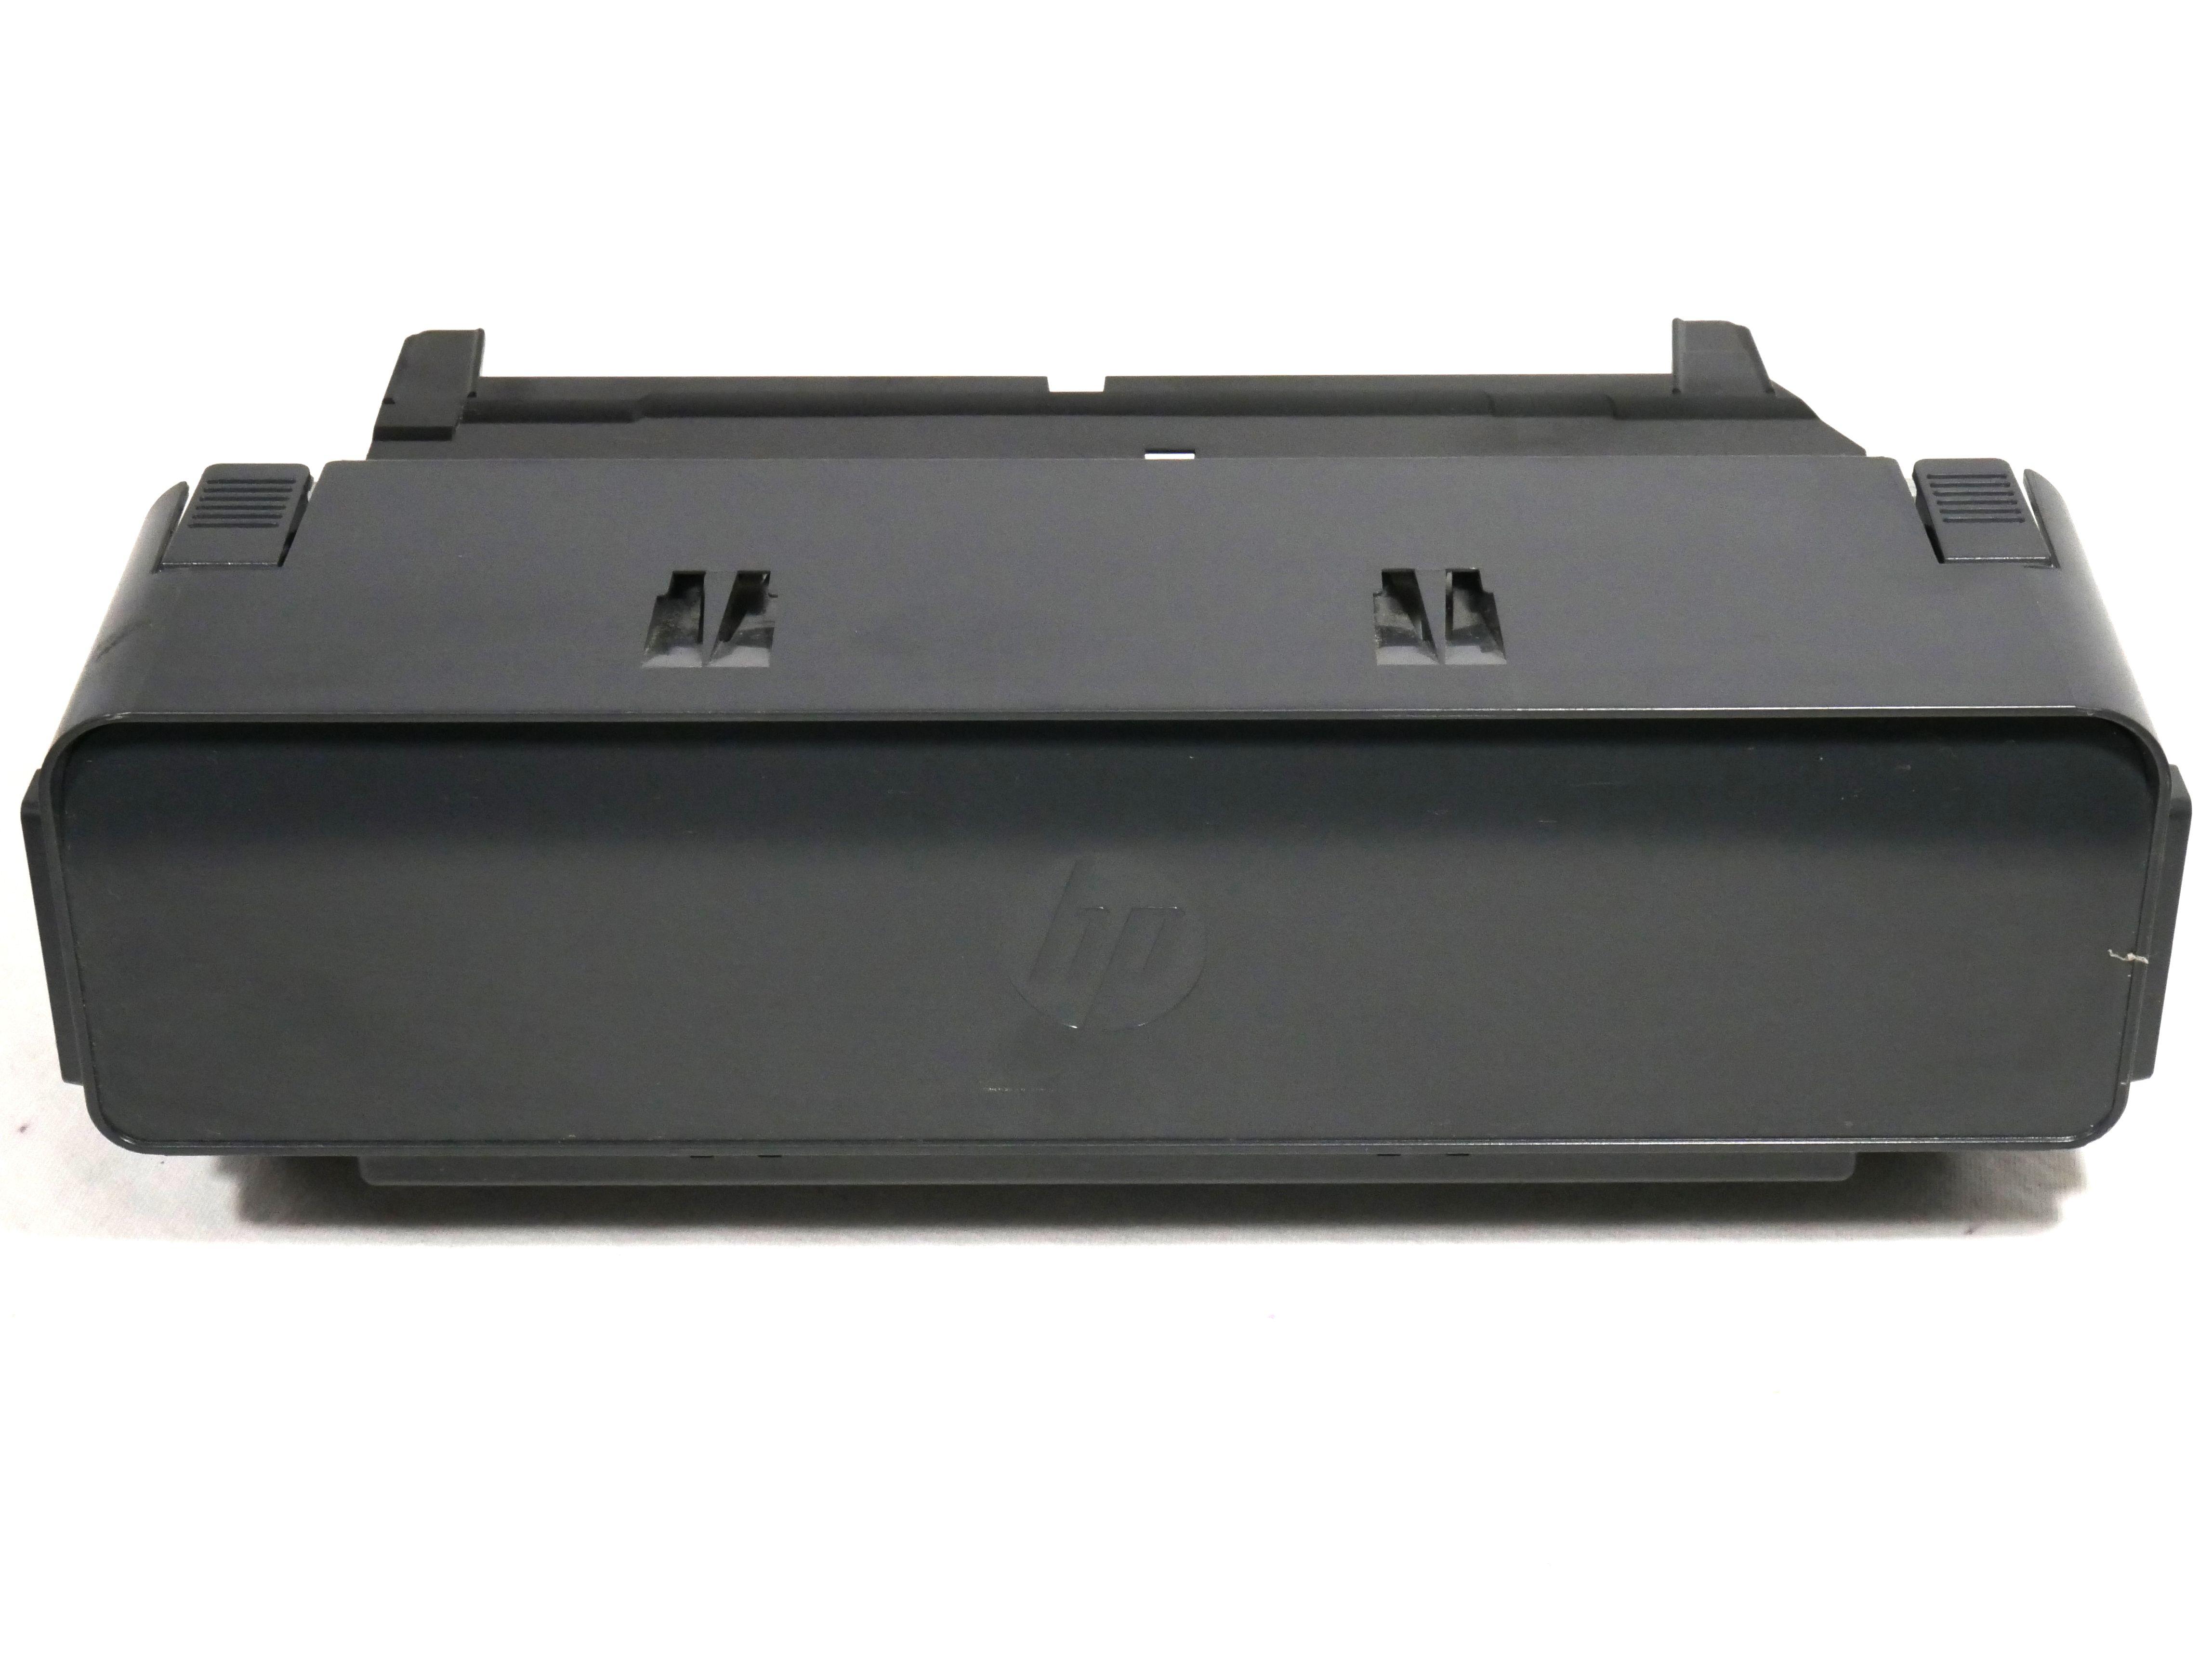 Hp Officejetpro8610 Duplexer Rearjamaccess A7f64 60043 Hp 8620 8625 8630 Ebay Replacement Parts Epson